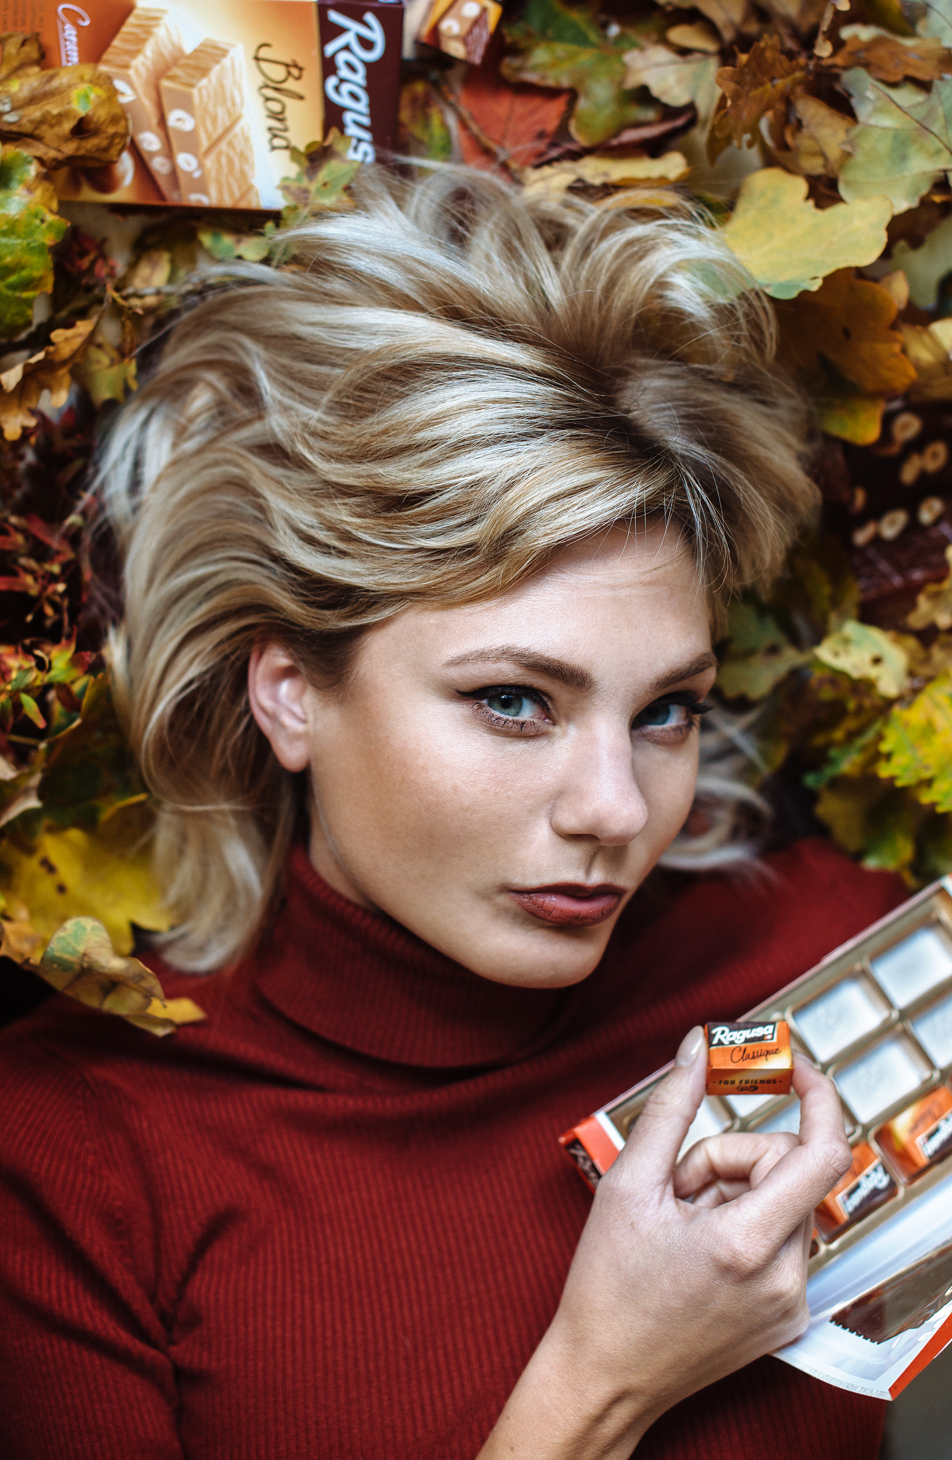 Ragusa Schokolade in Deutschland_Ragusa Blond_Noir_Classique_Erfahrungen_Test-final2